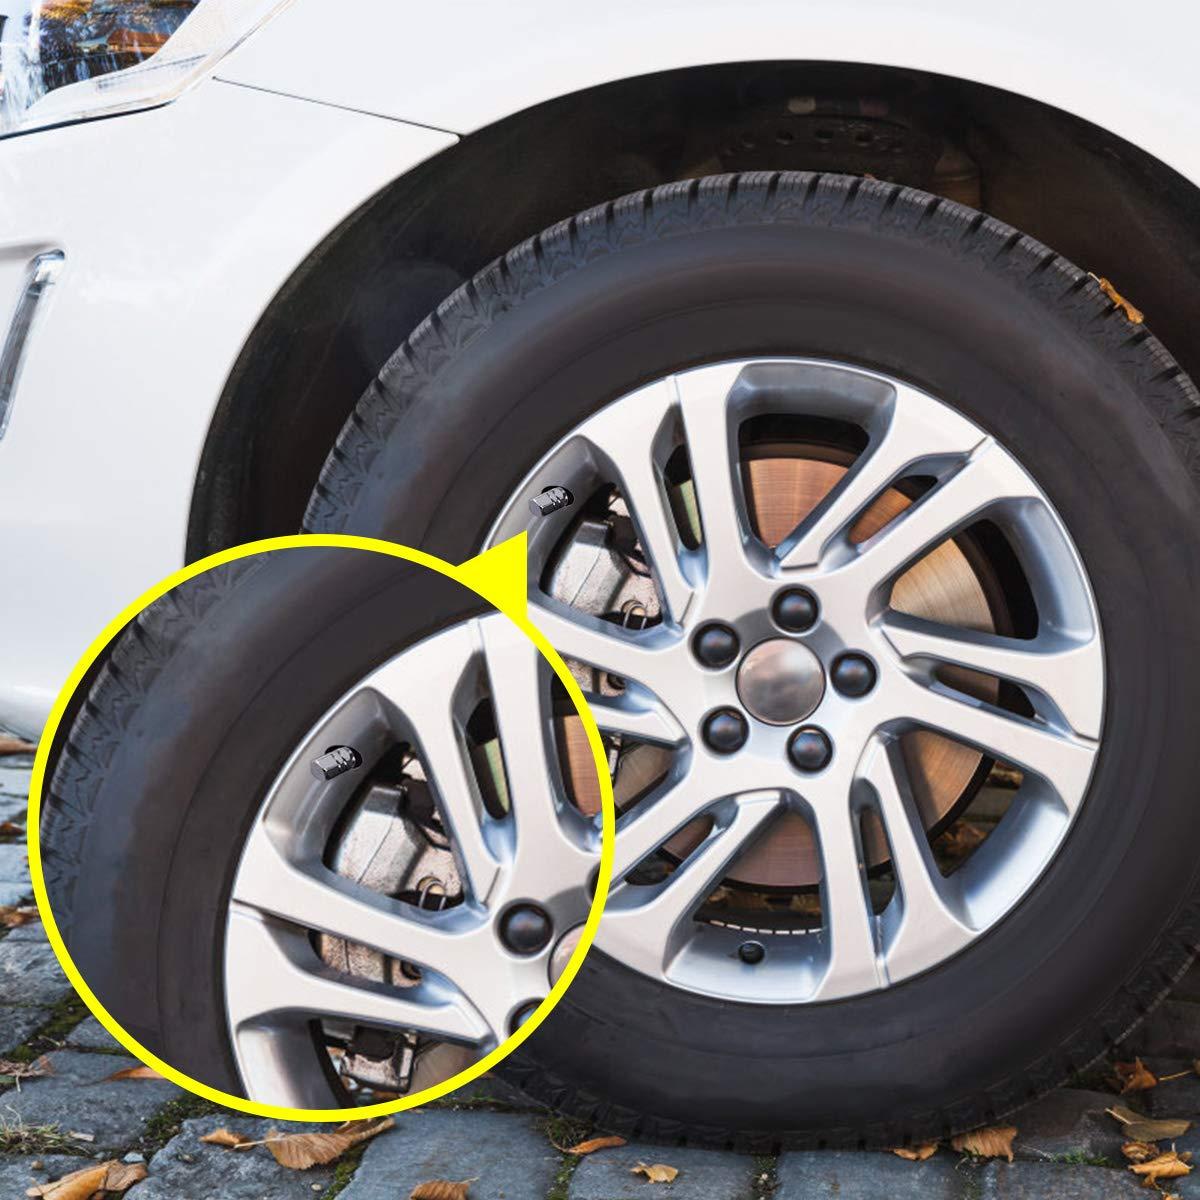 Silver Natuce 8 Pieces Tire Stem Valve Caps Aluminium Car Wheel Dustproof Caps for Car Motorcycle Bike